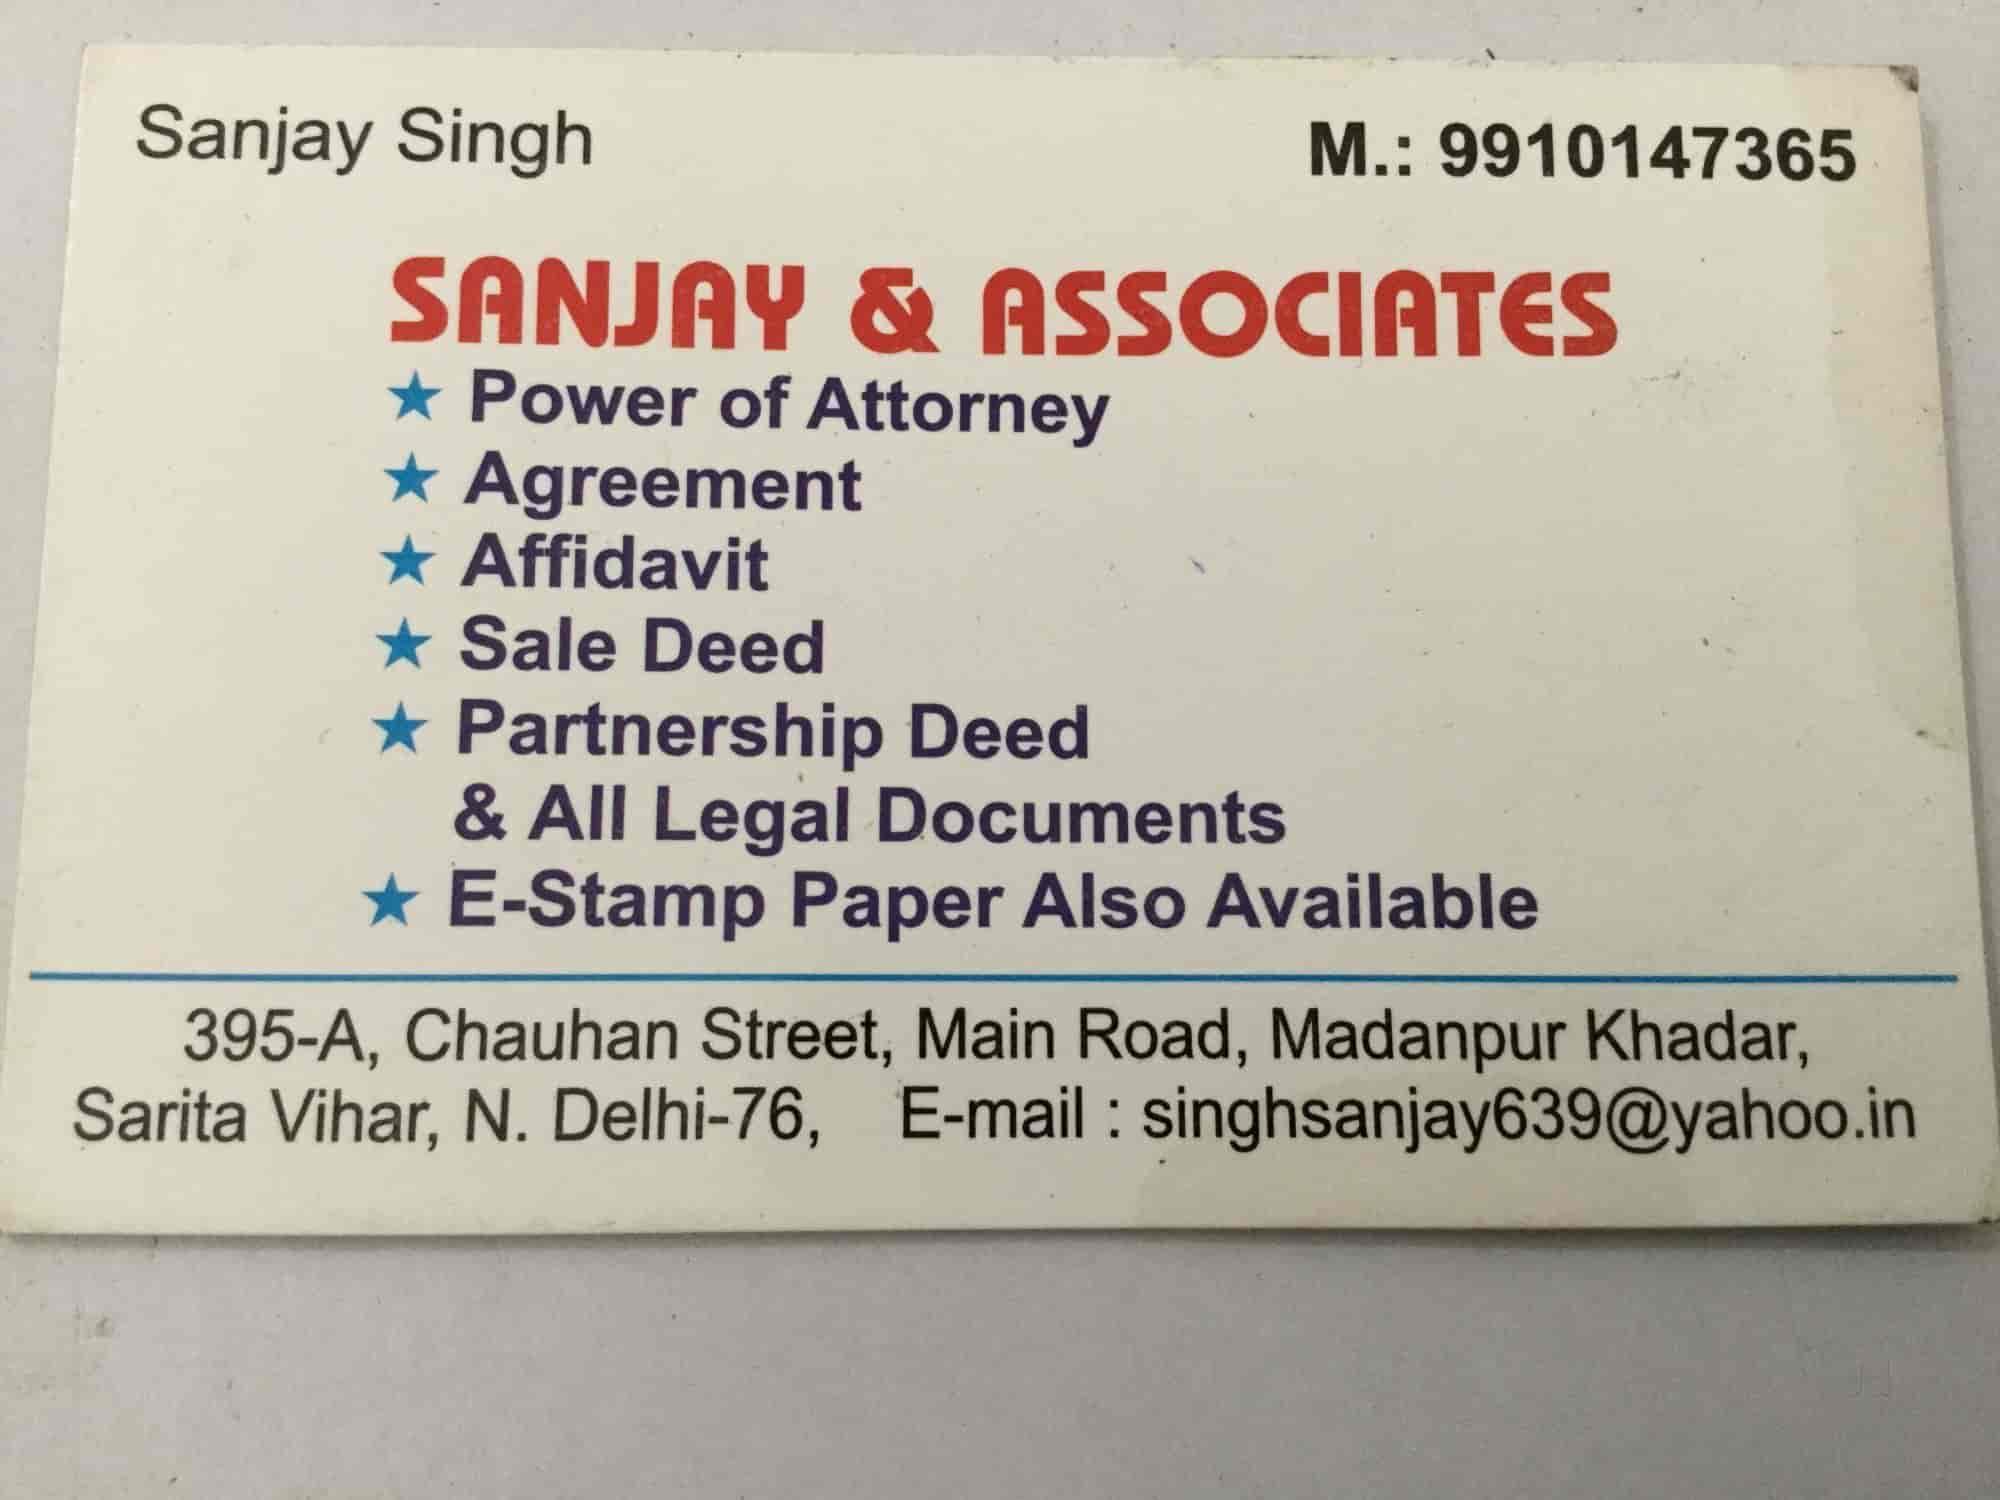 sanjay associates madanpur khadar sunjay associates